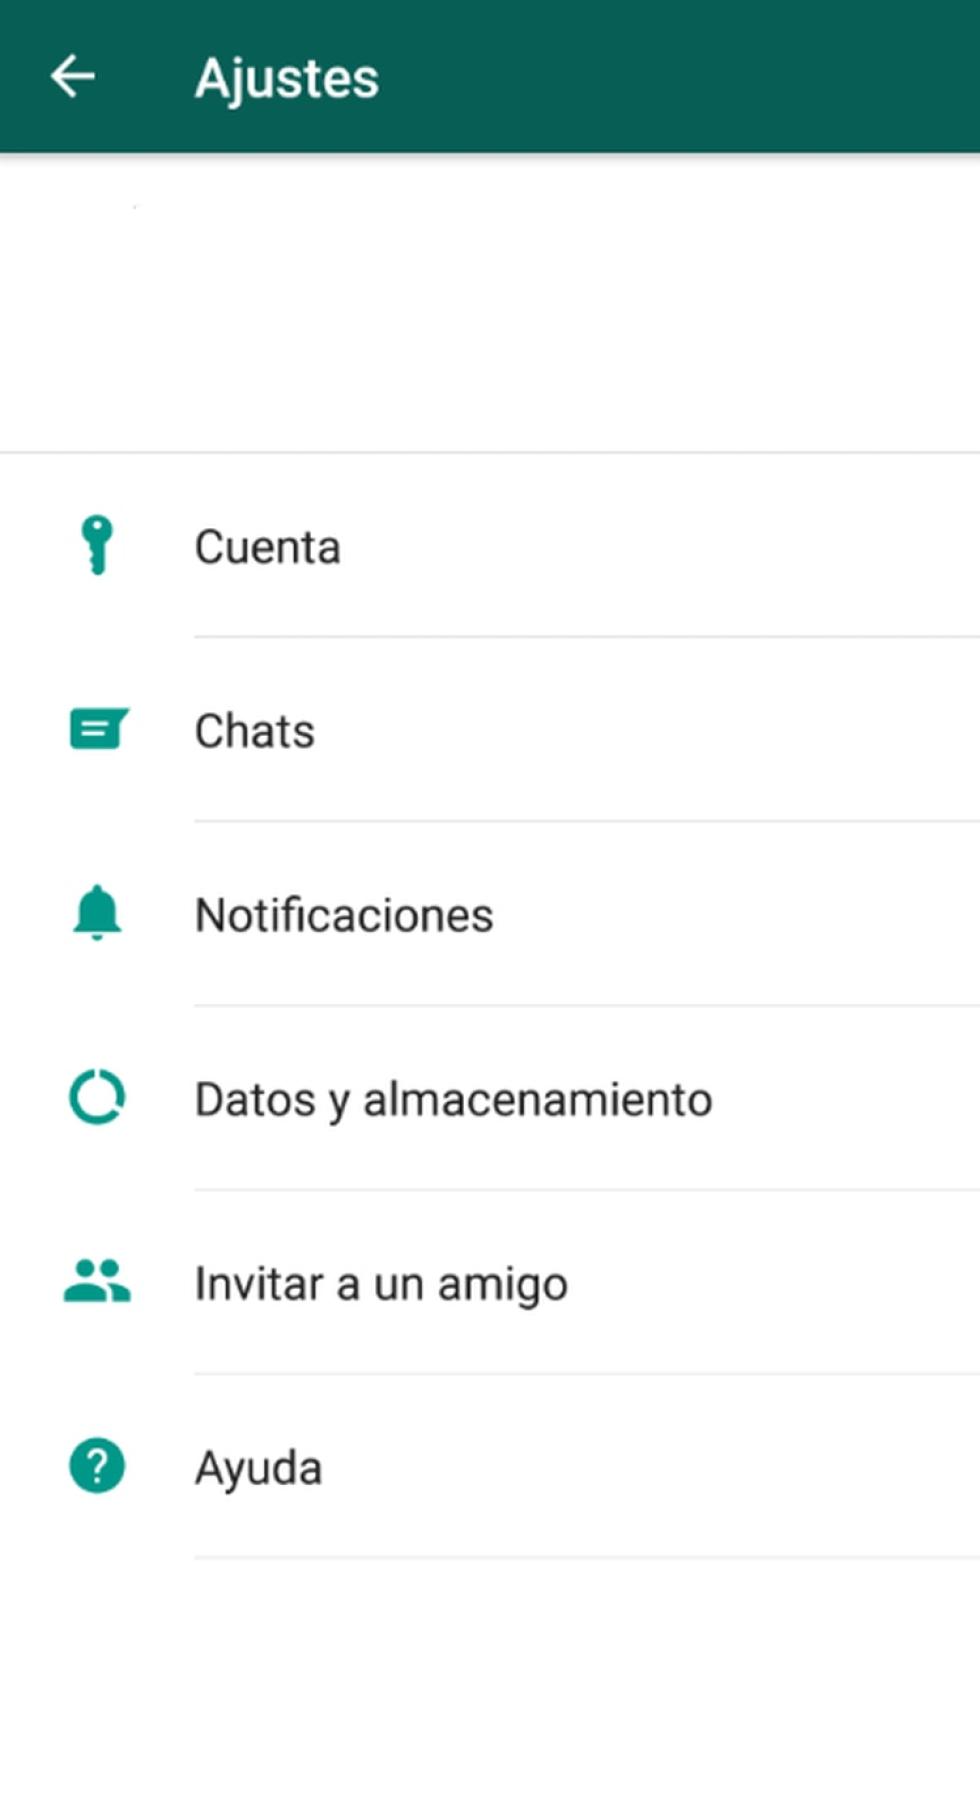 whatsapp-ajustes-cambiar-numero.png